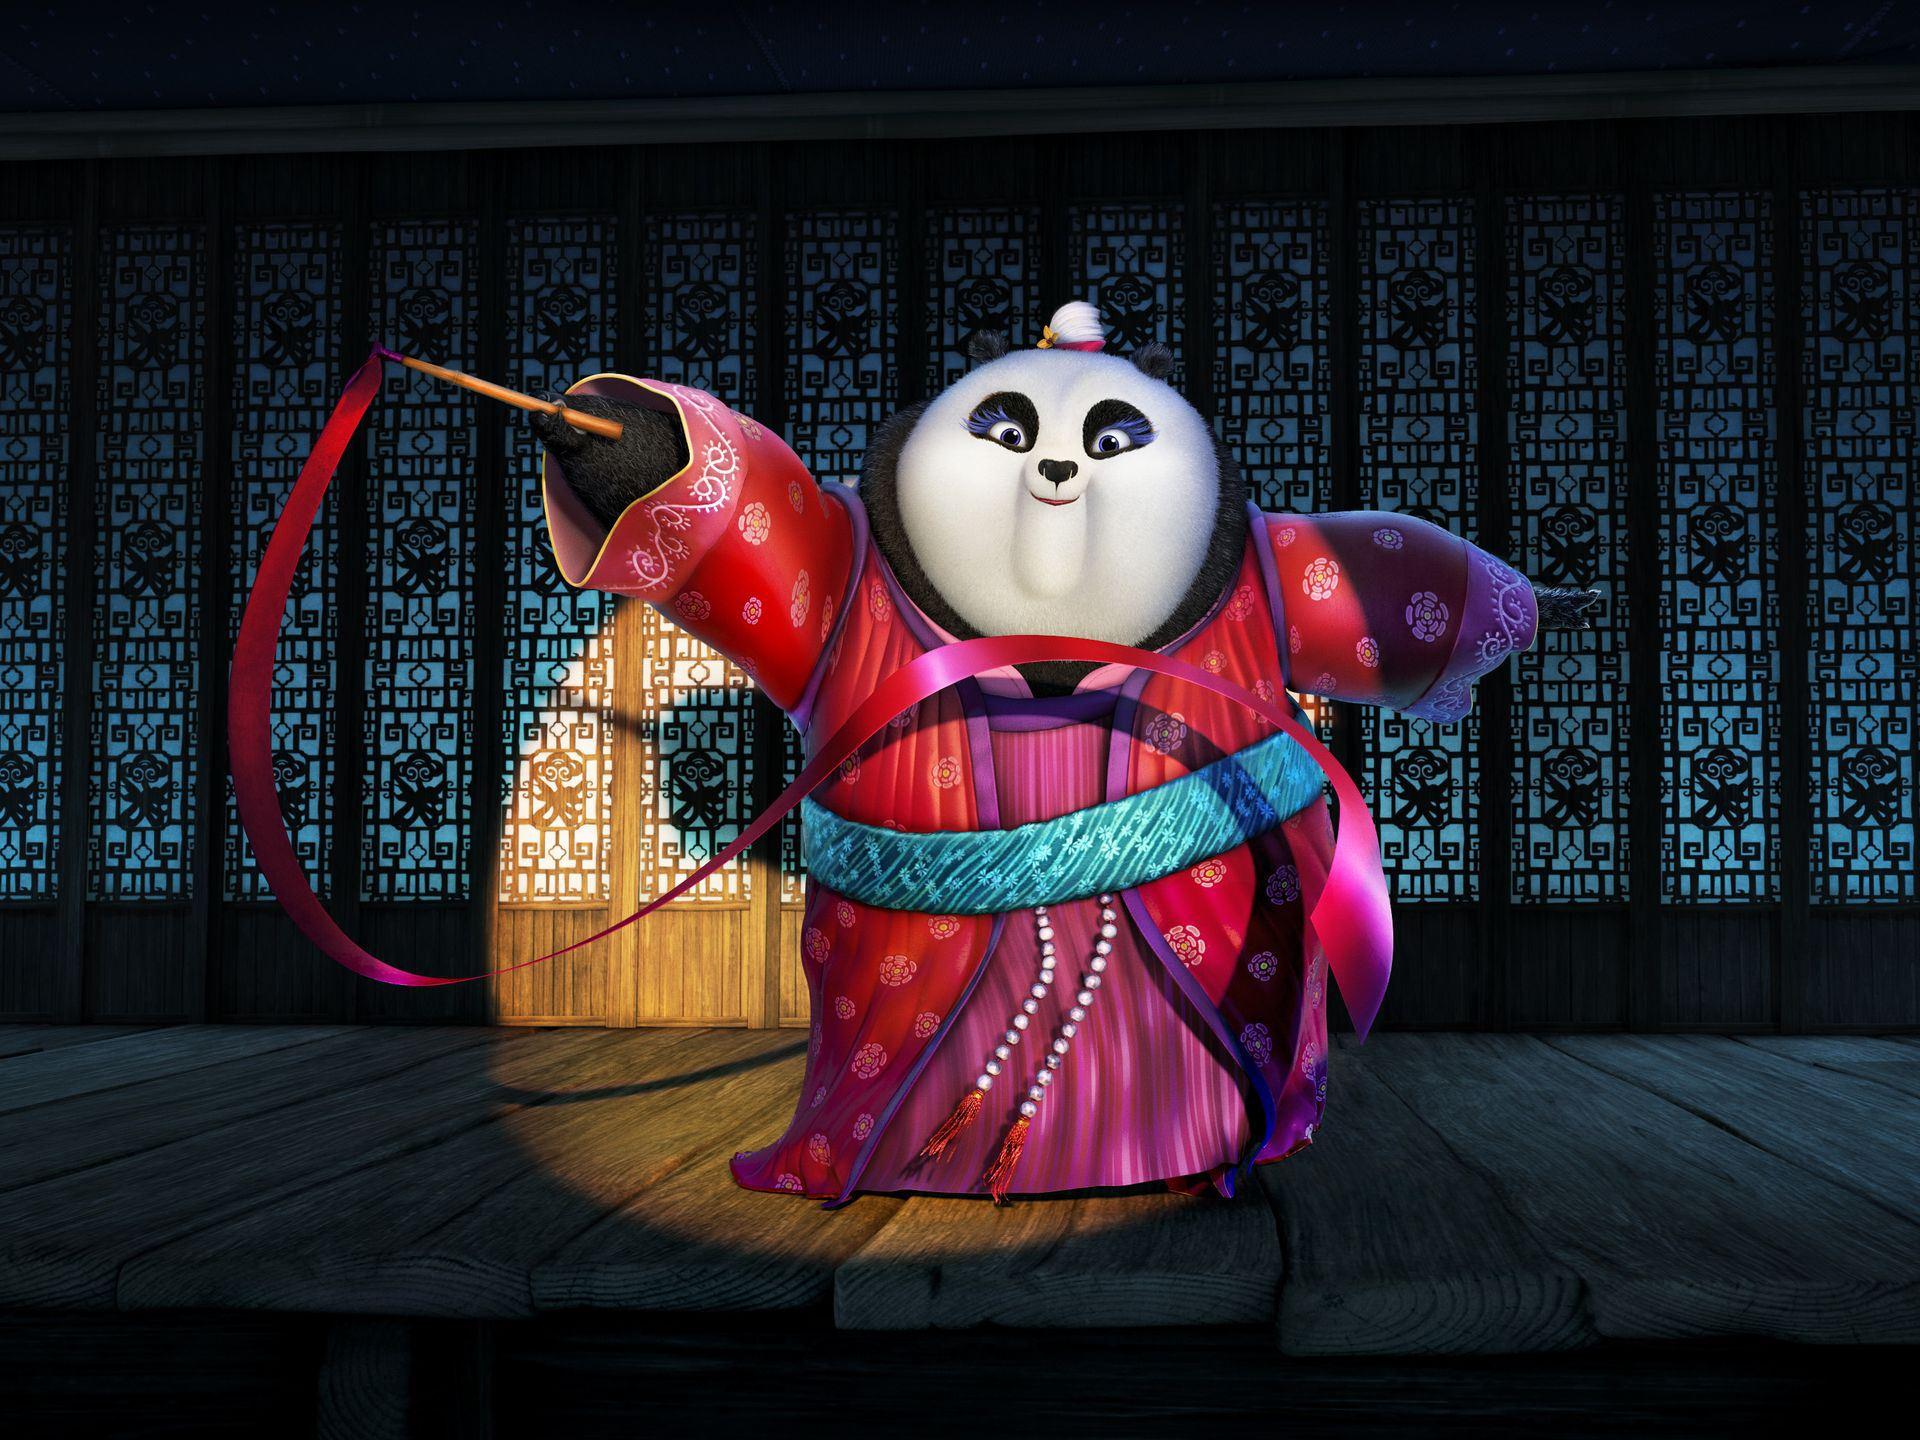 fu panda kung trailer movie mei po teaser tigress voice film voices